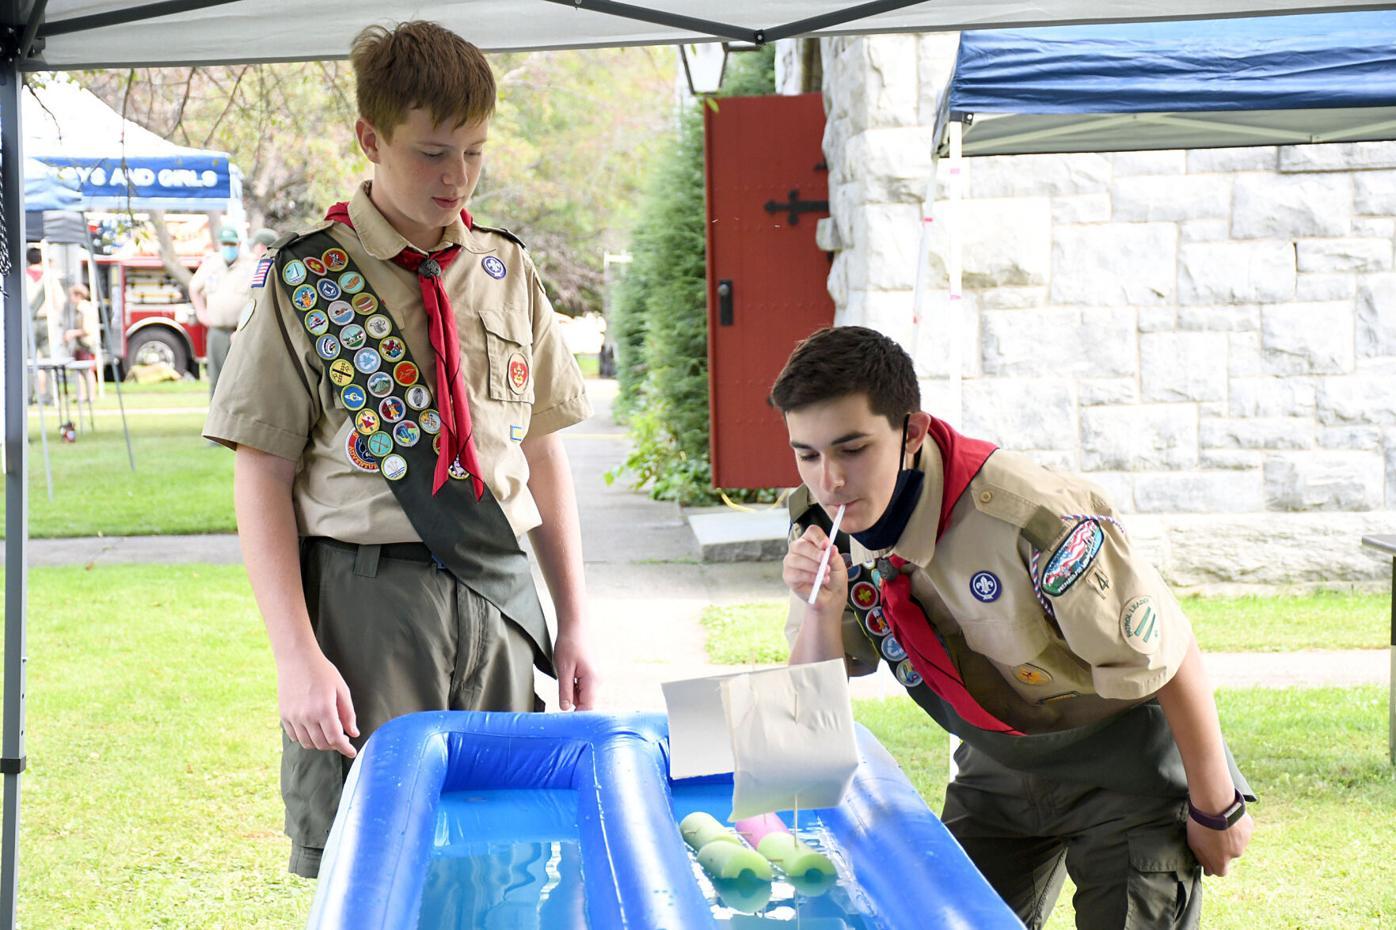 Two scouts do the raingutter regata